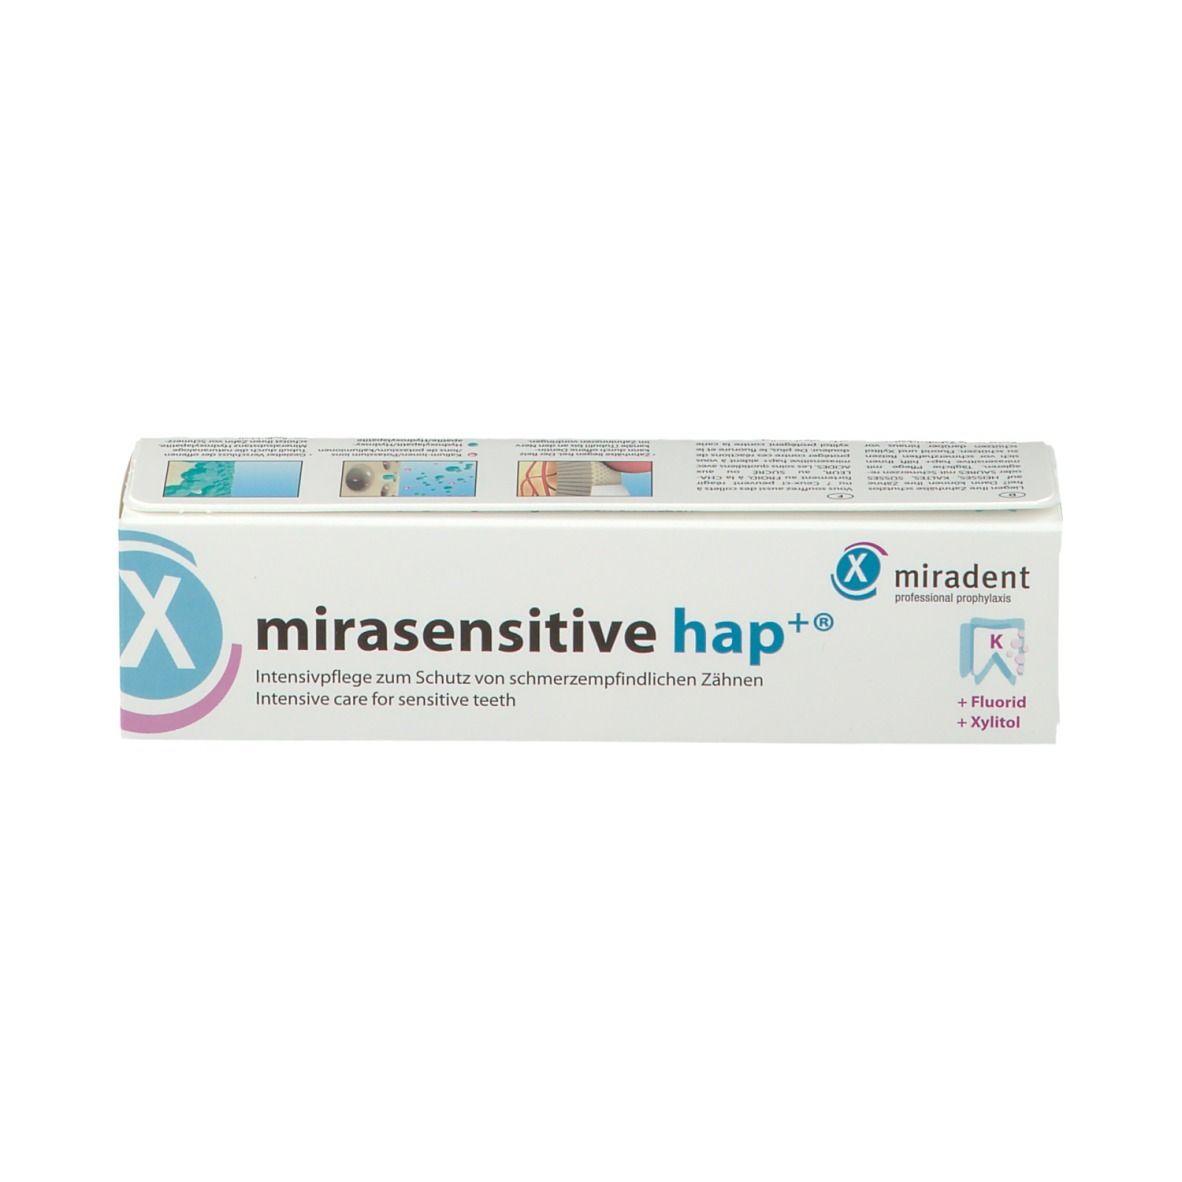 miradent mirasensitive hap+ Zahncreme